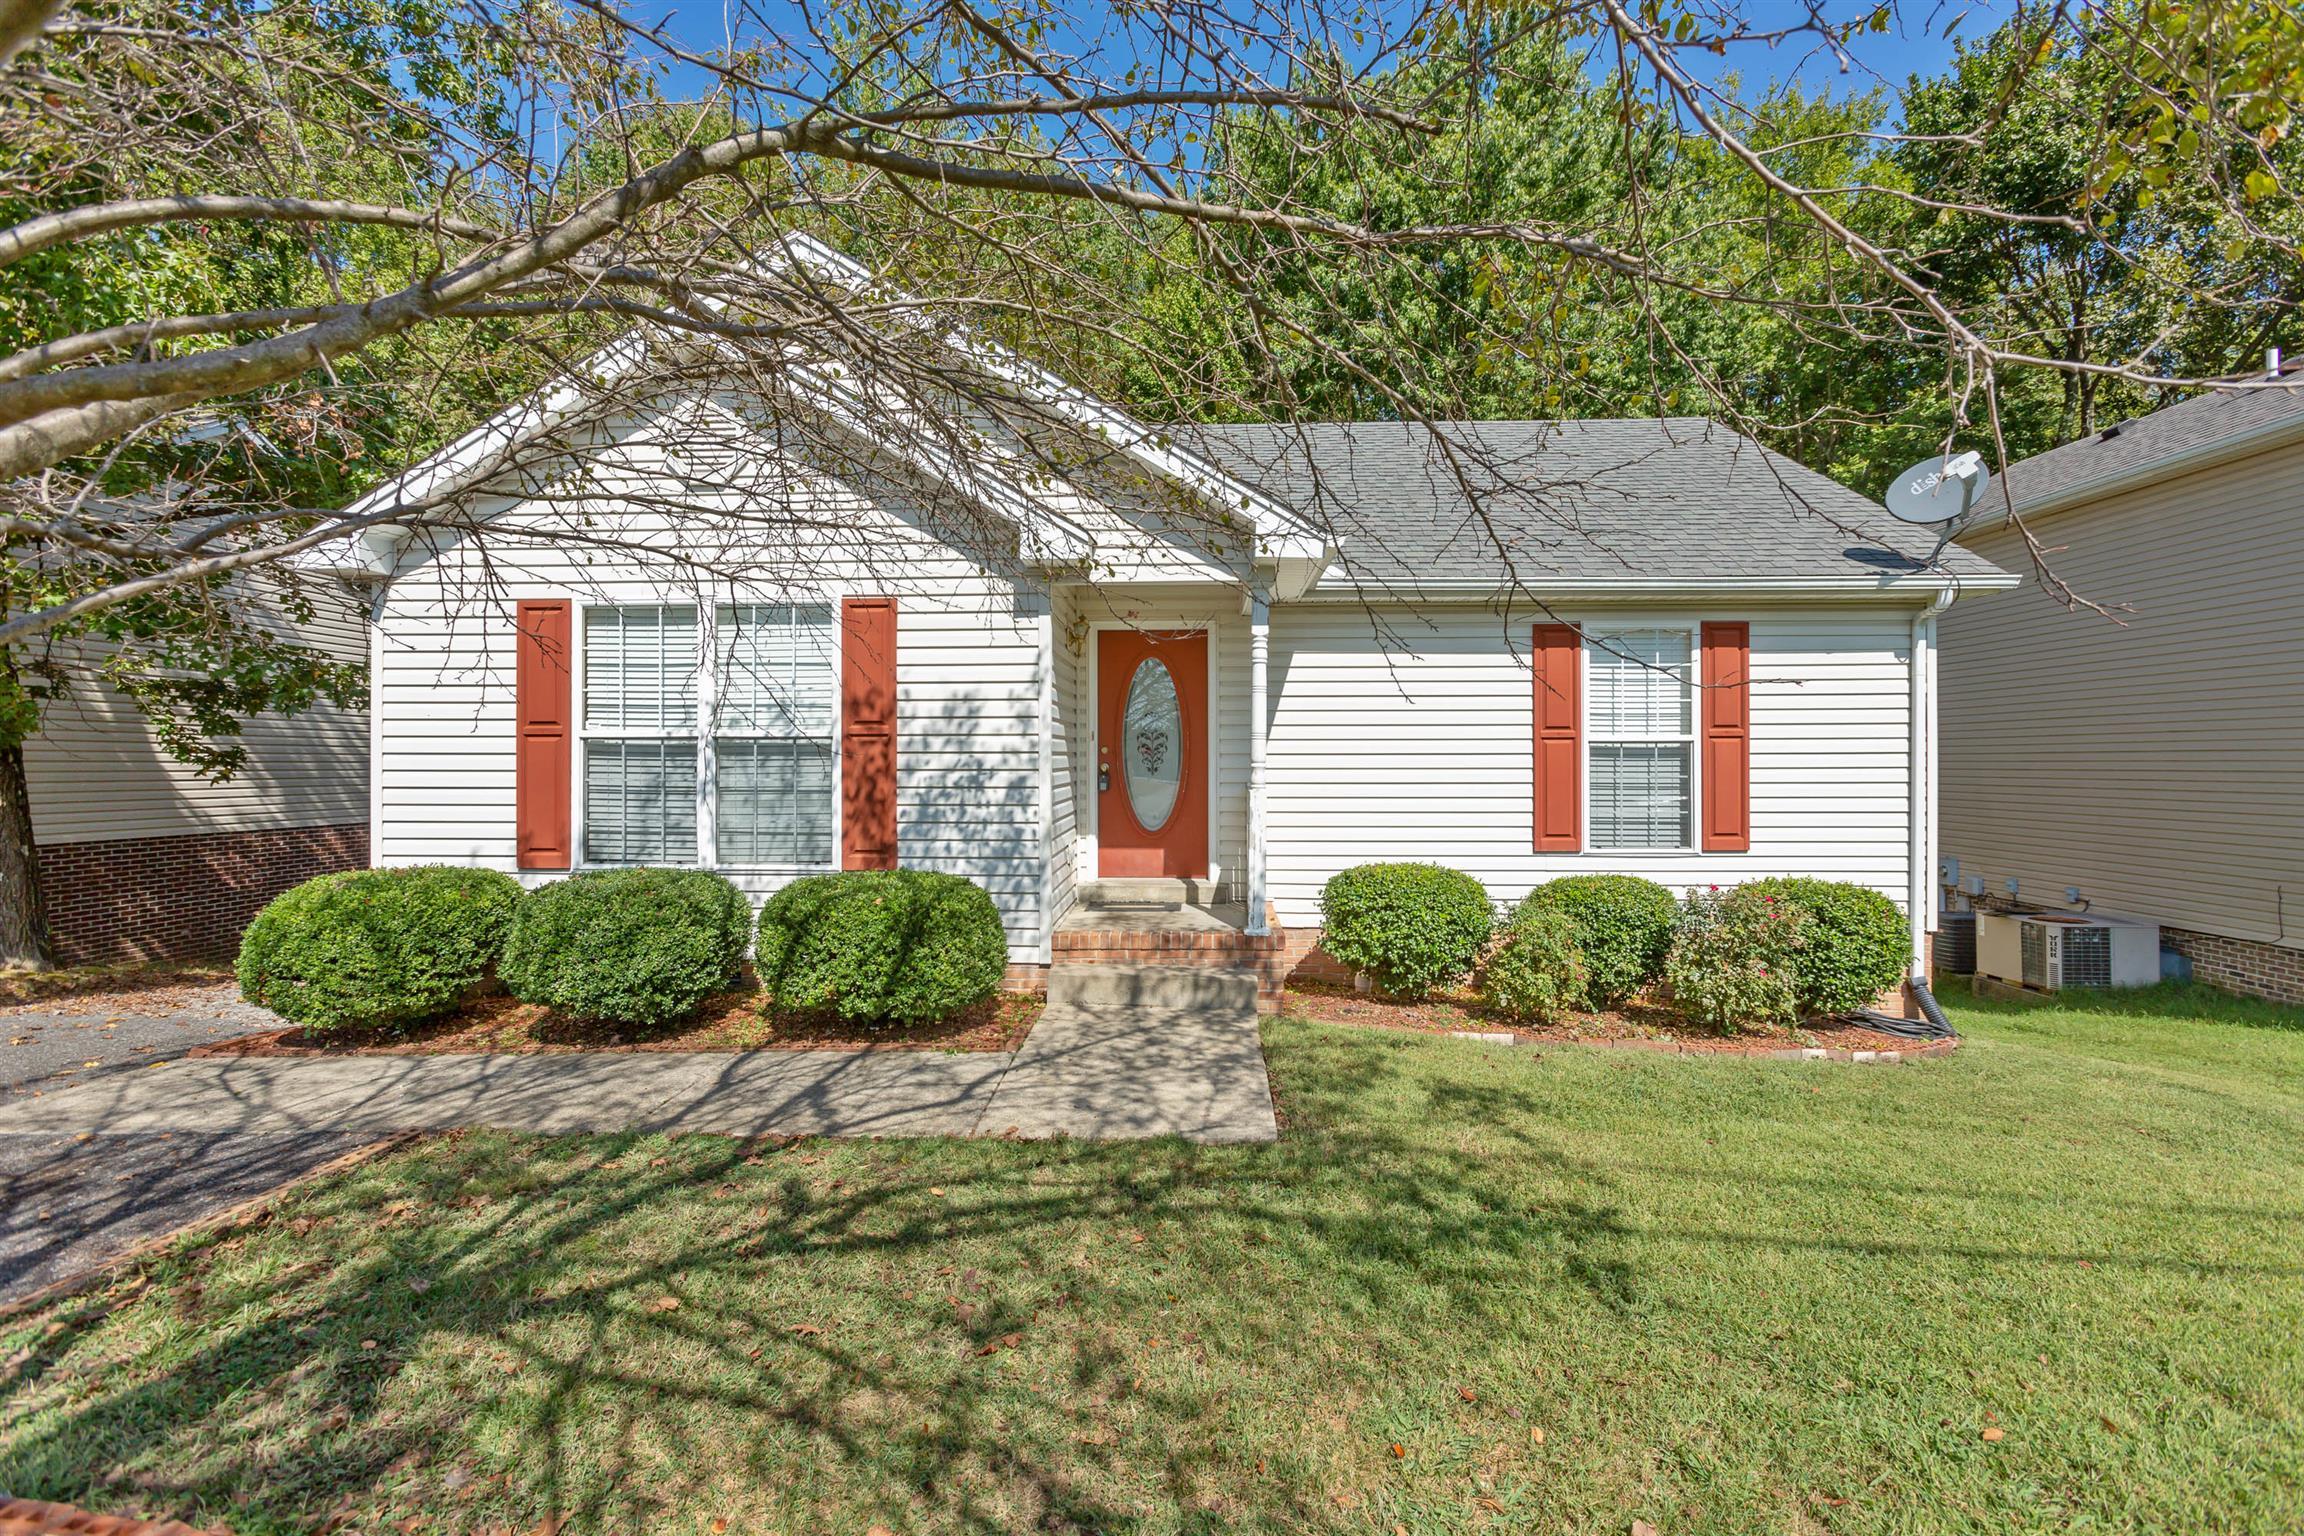 151 Sleepy Hollow Dr, Springfield, TN 37172 - Springfield, TN real estate listing